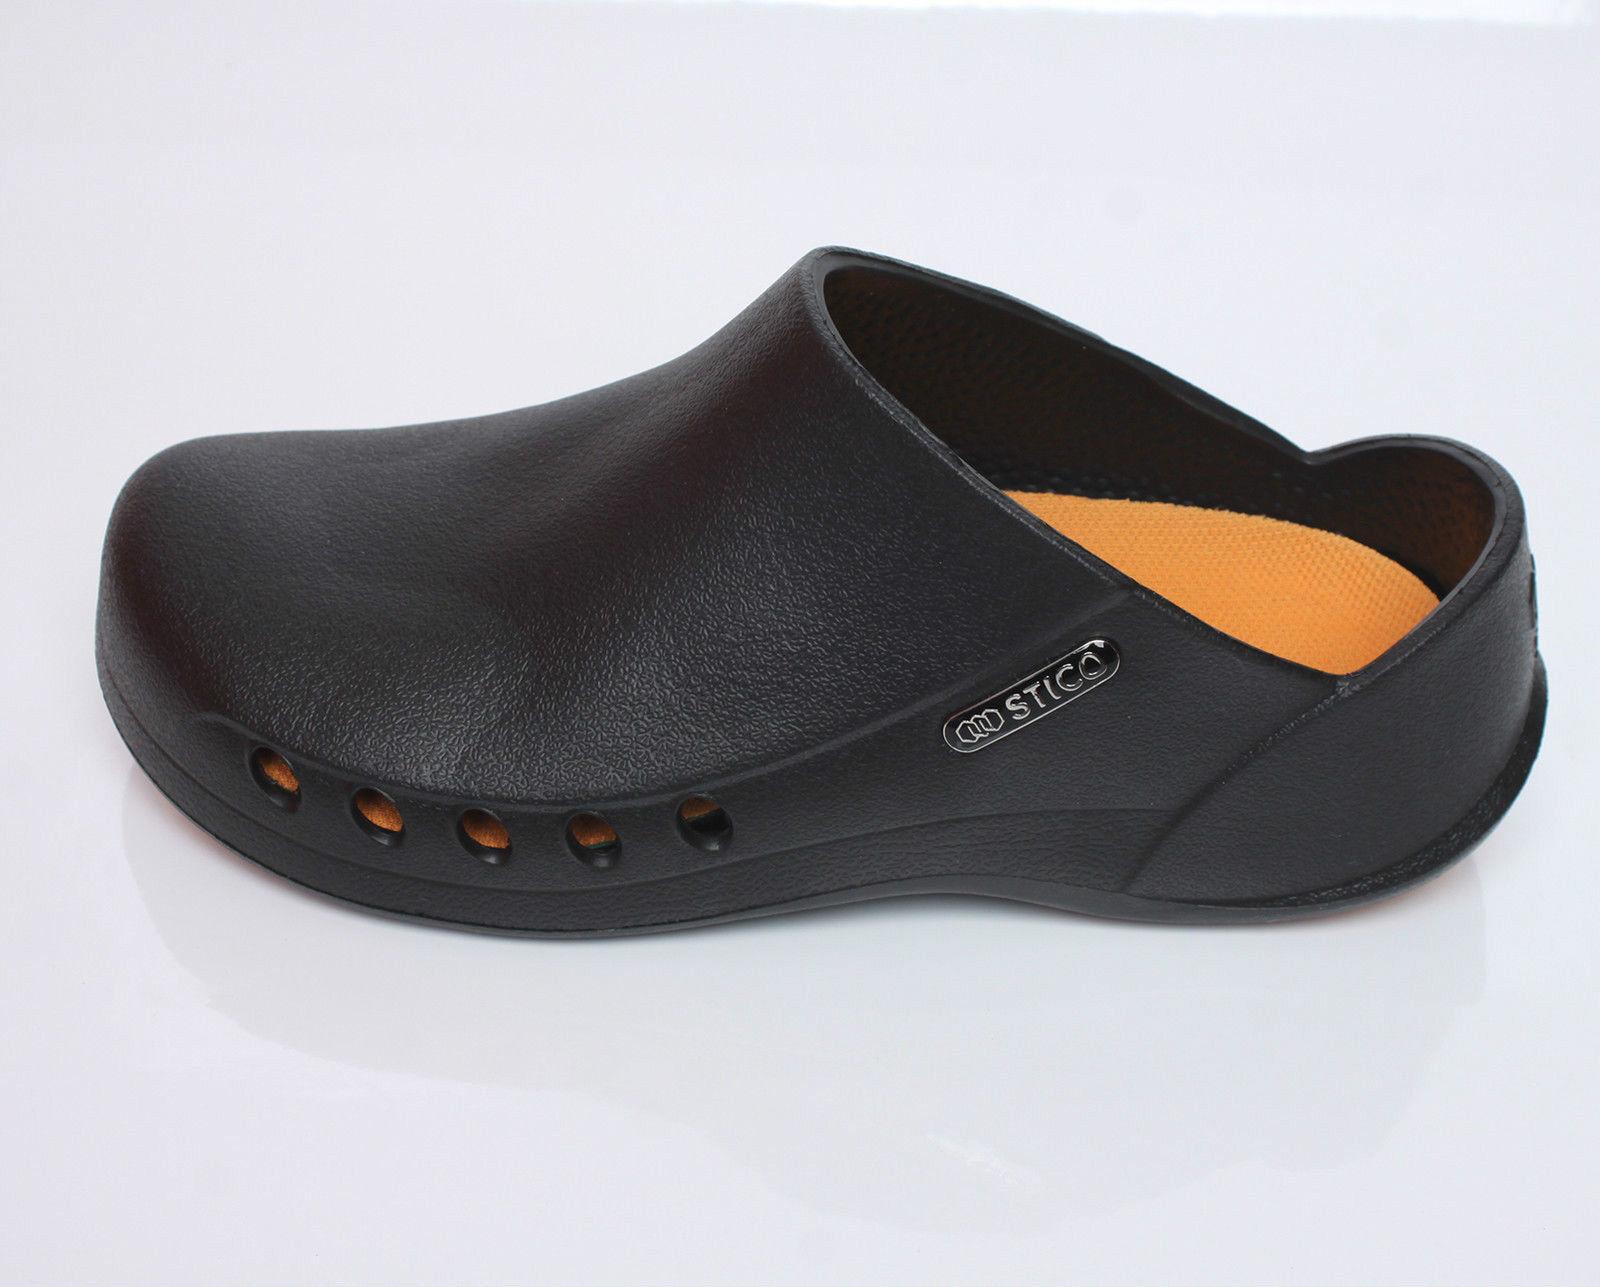 Womens Chef Kitchen shoes Non-Slip Cook Slipper Indoor Clean BLACK E_n